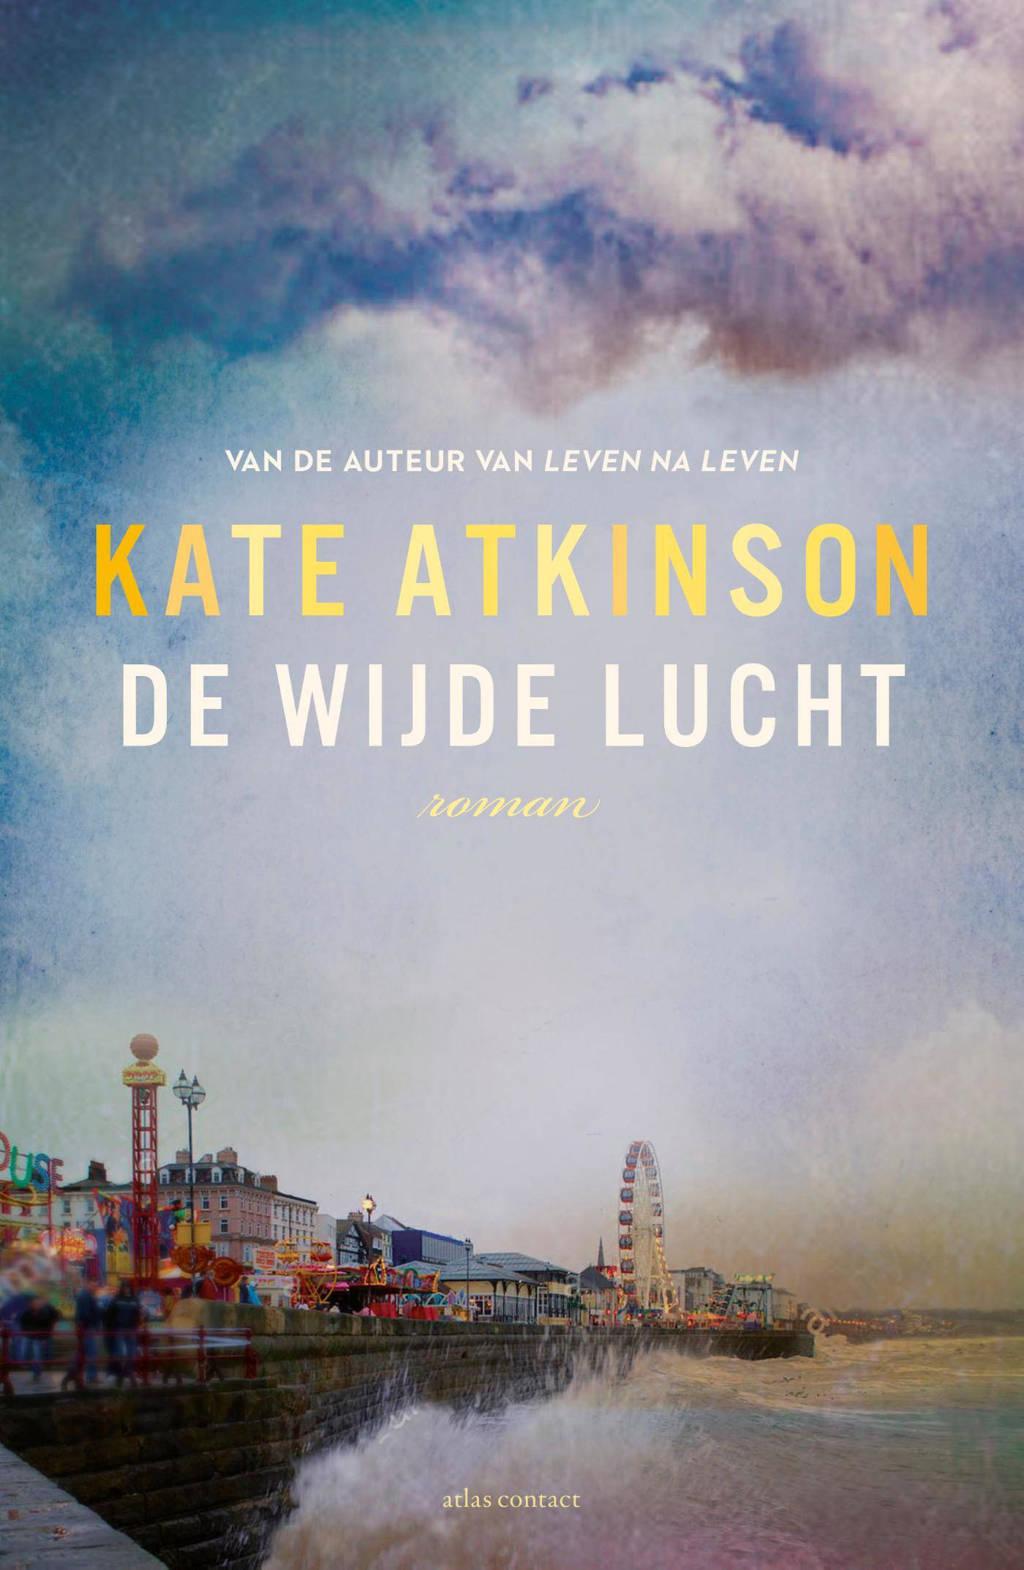 De wijde lucht - Kate Atkinson